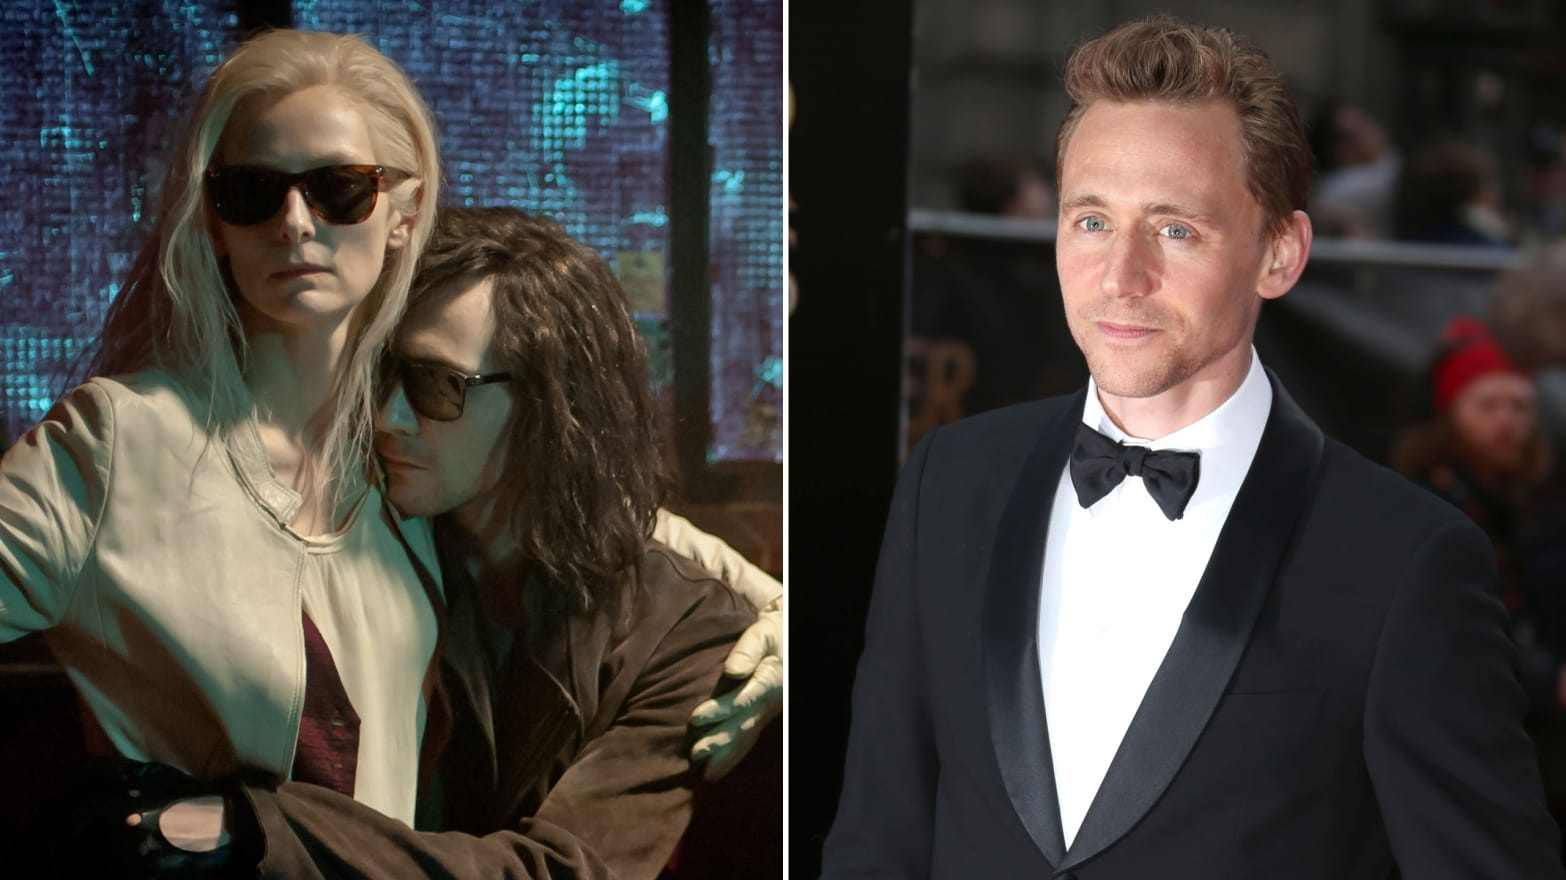 Tom Hiddleston On His Rocker-Vampire in 'Only Lovers Left Alive